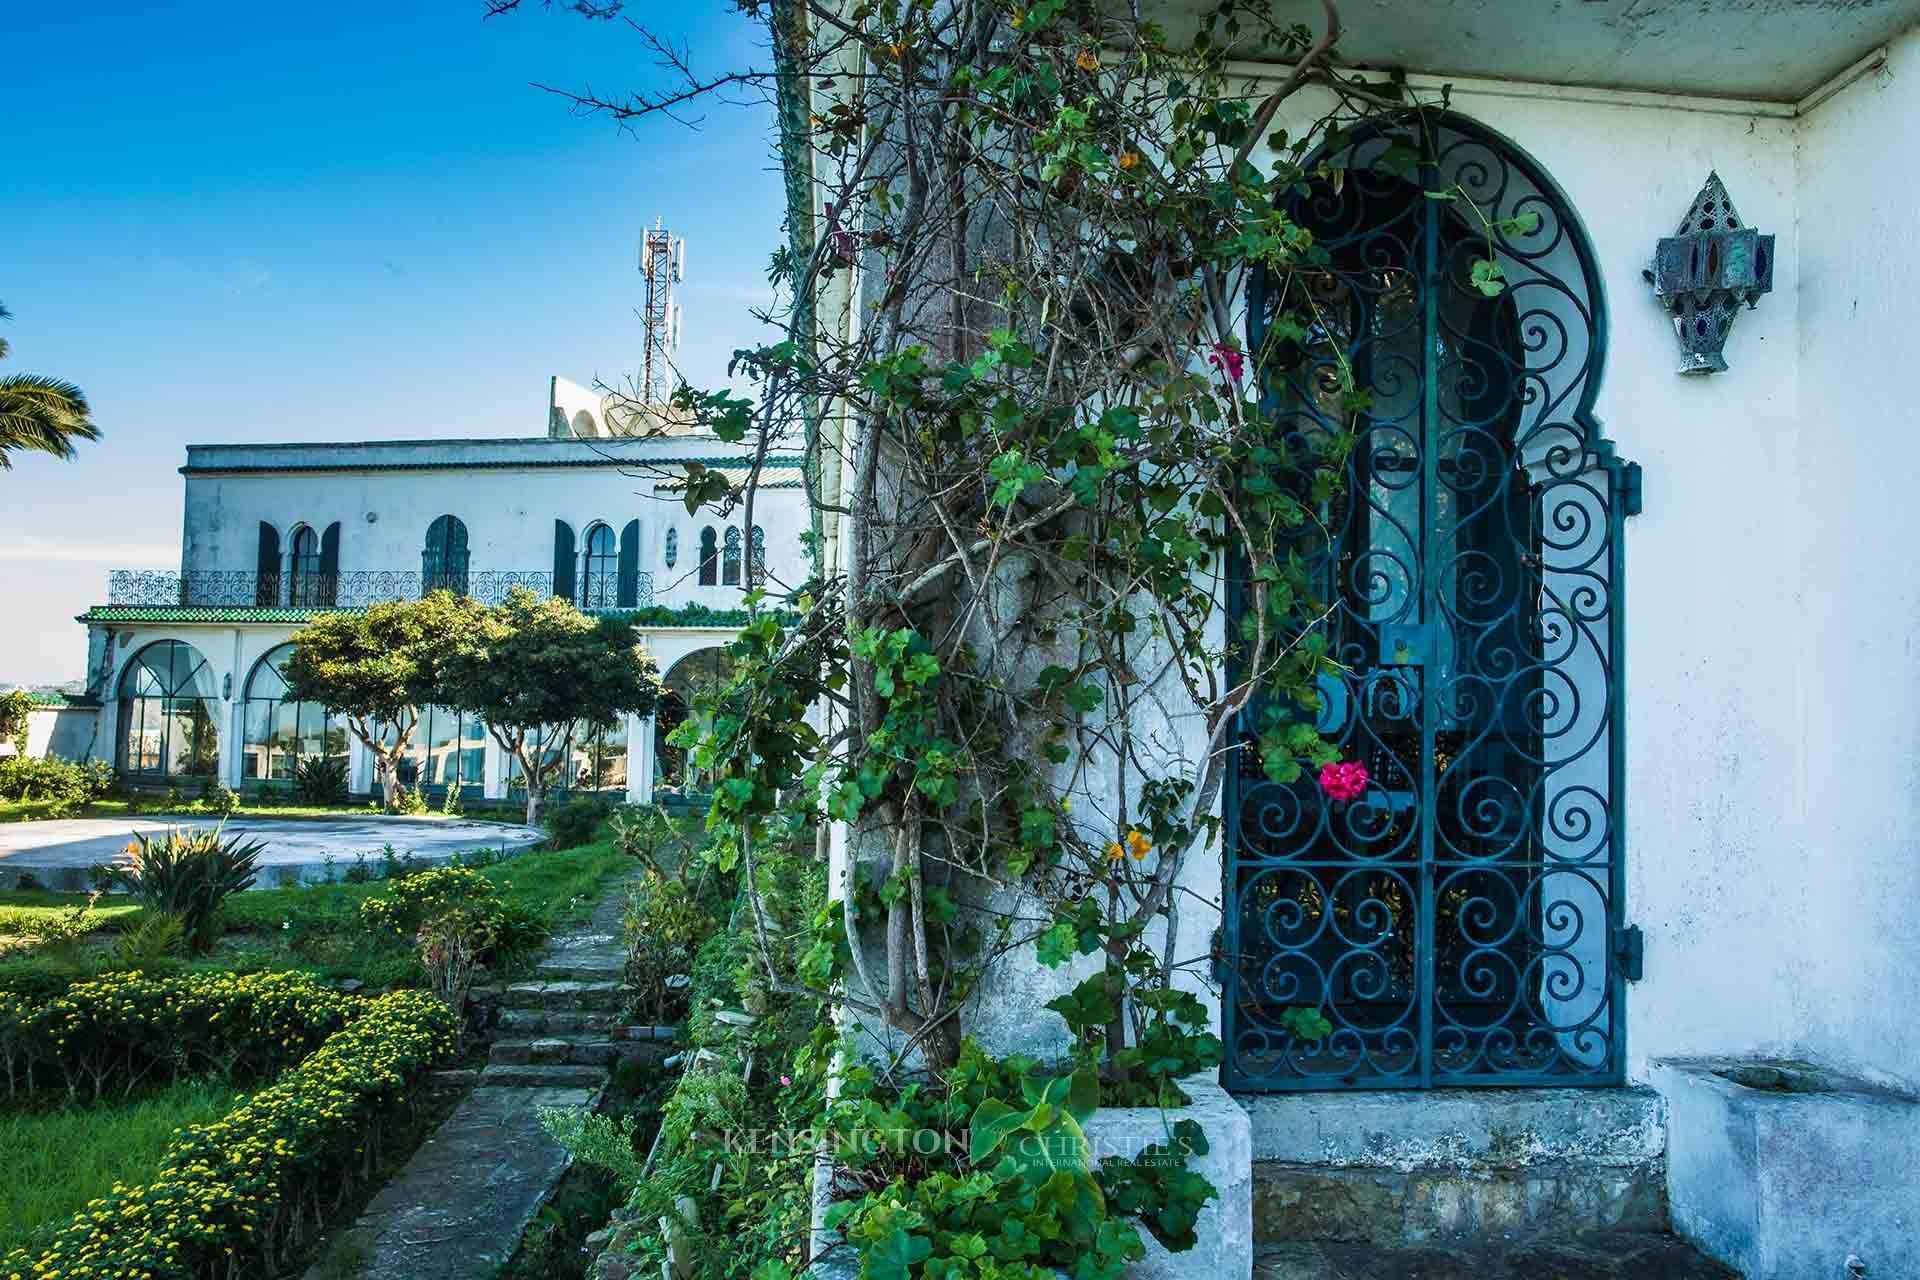 KPPM01126: Villa Niza Villa de luxe Tanger Maroc